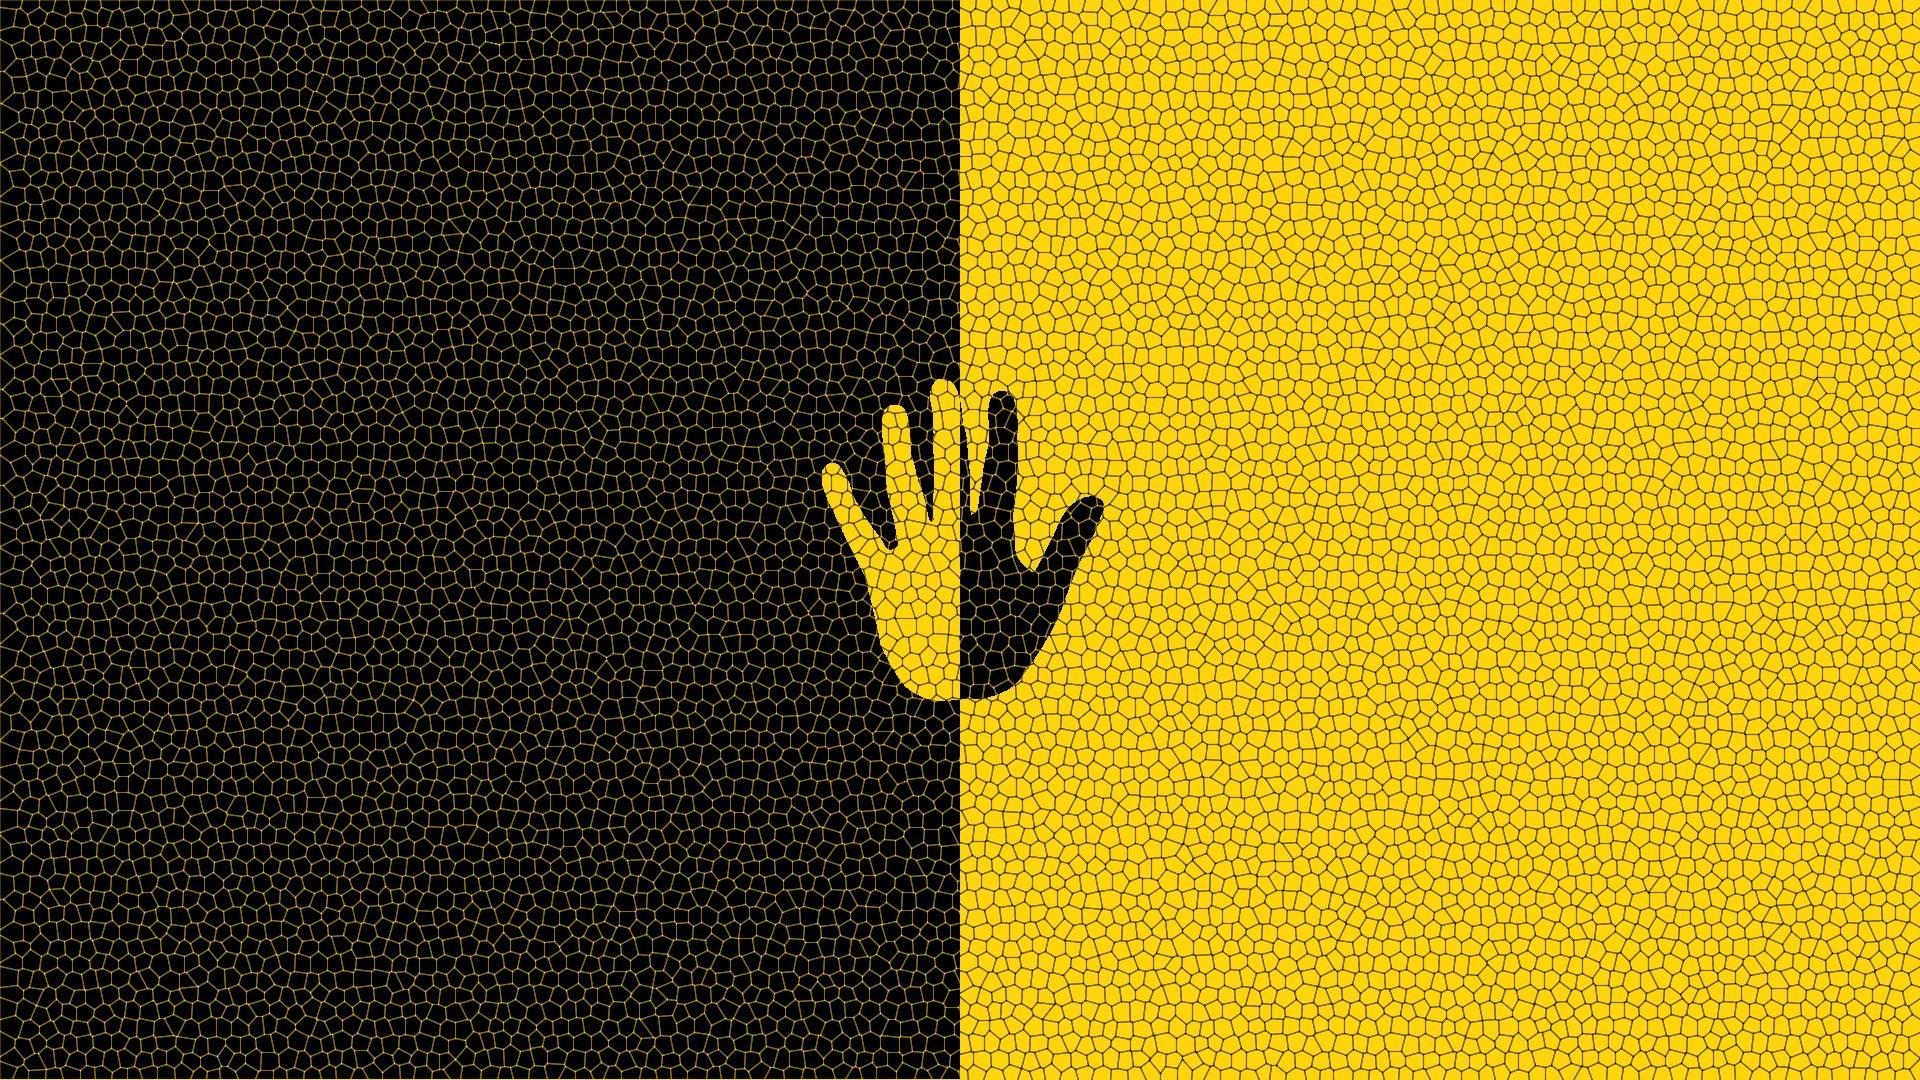 the yellow wallpaper musings